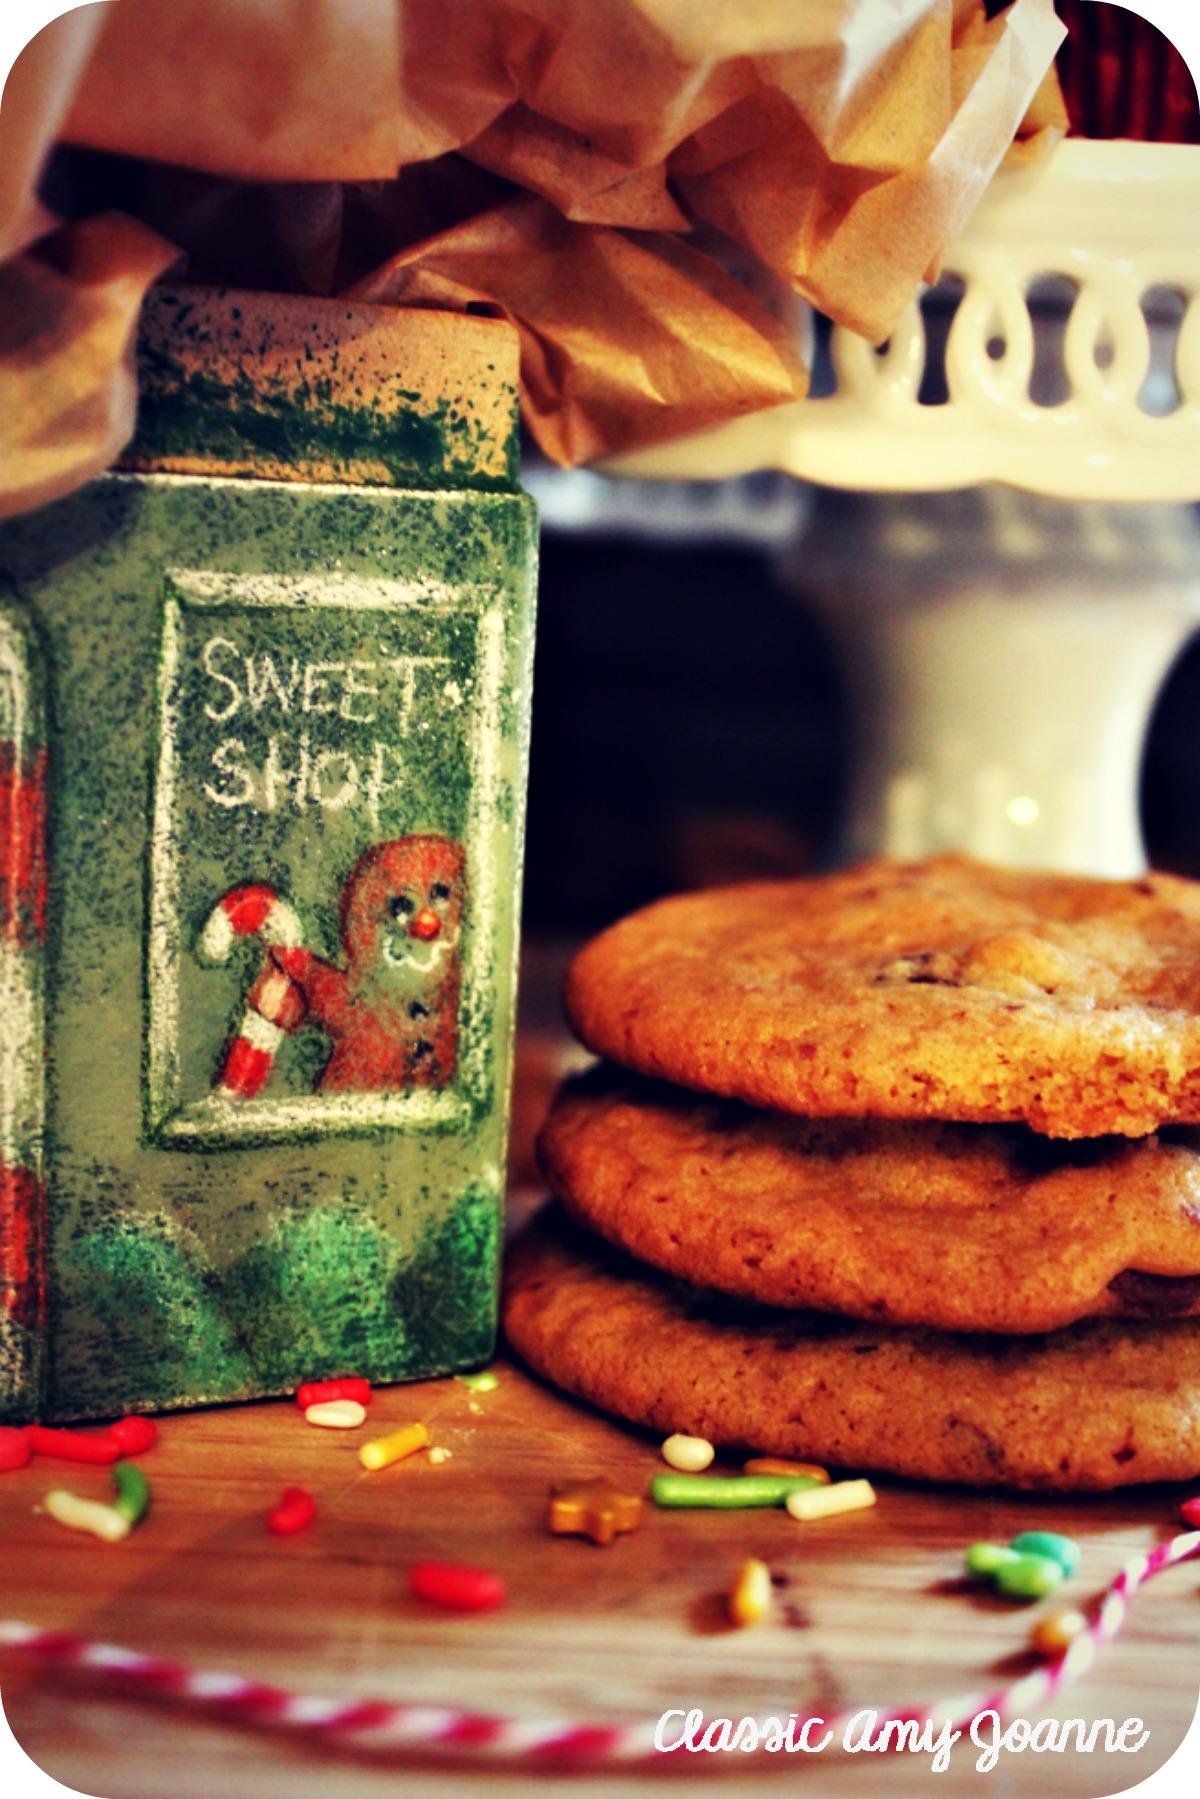 sweet good 9 (2)